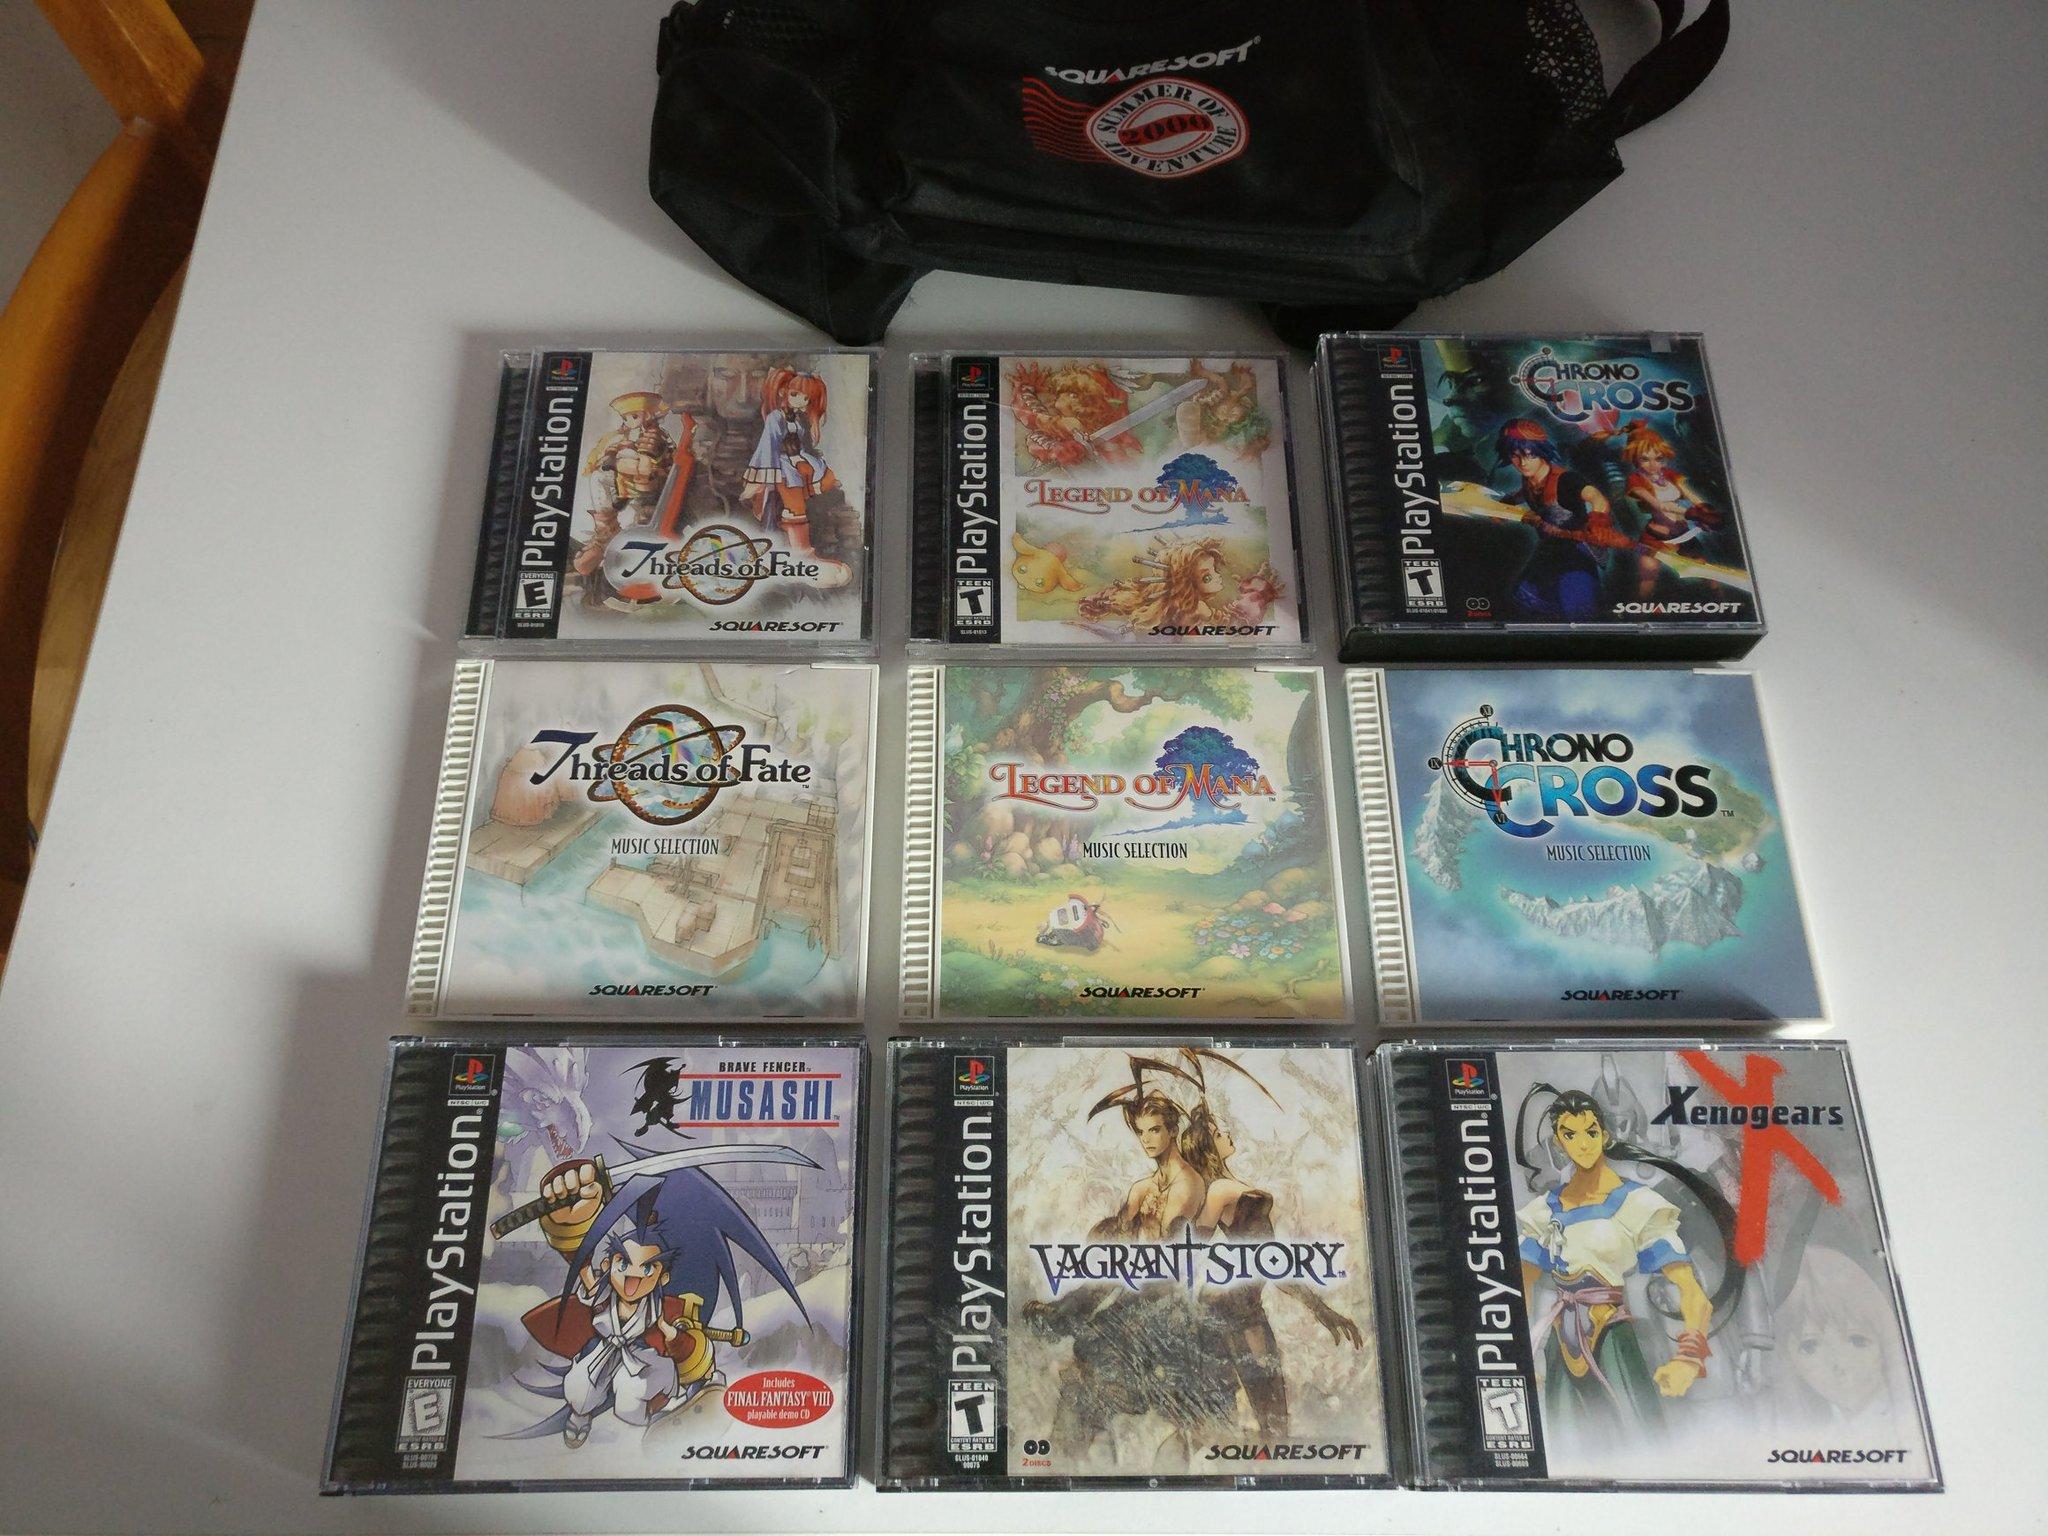 RPG Playstation